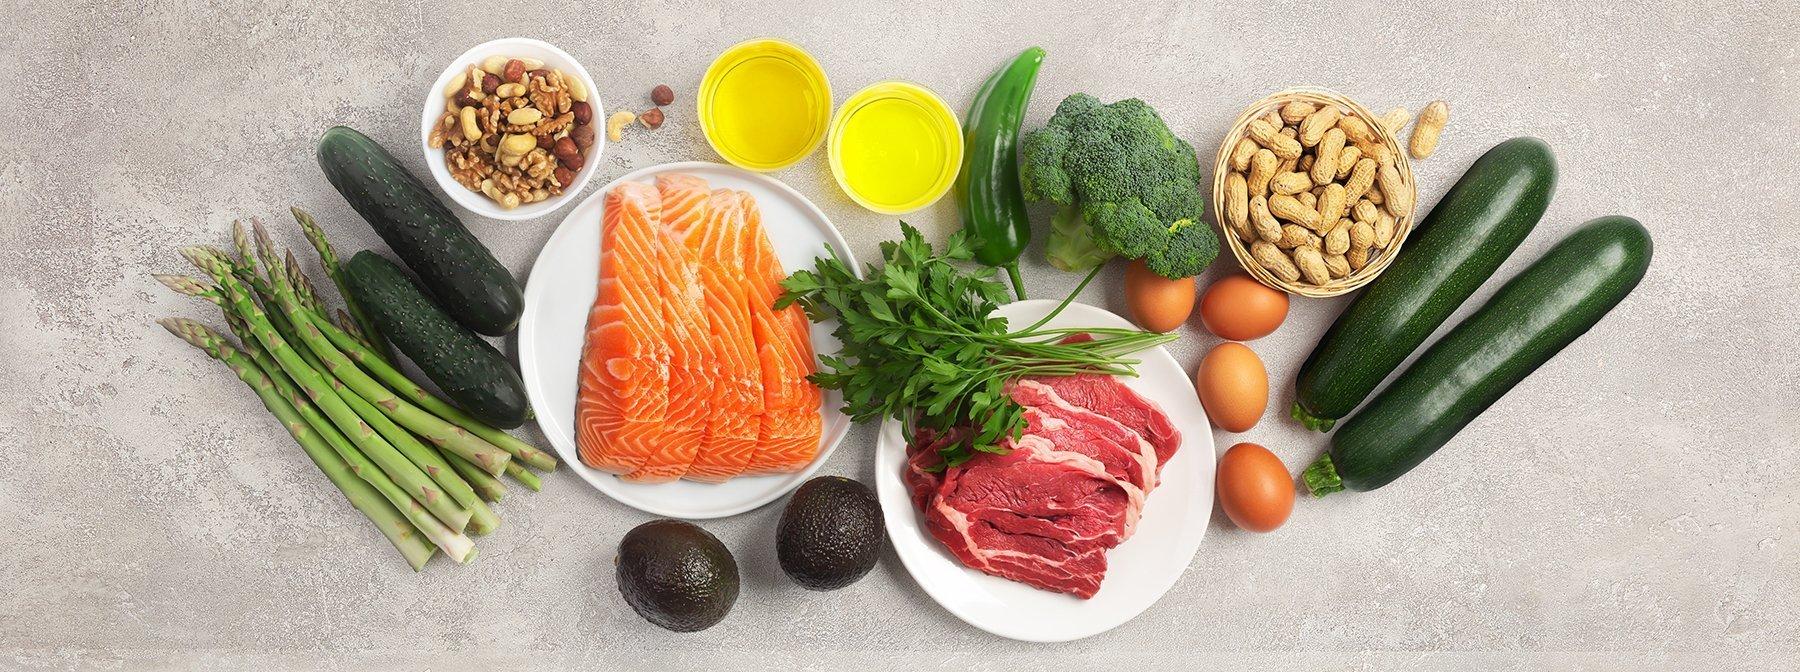 Muskelaufbau mit ketogener Ernährung